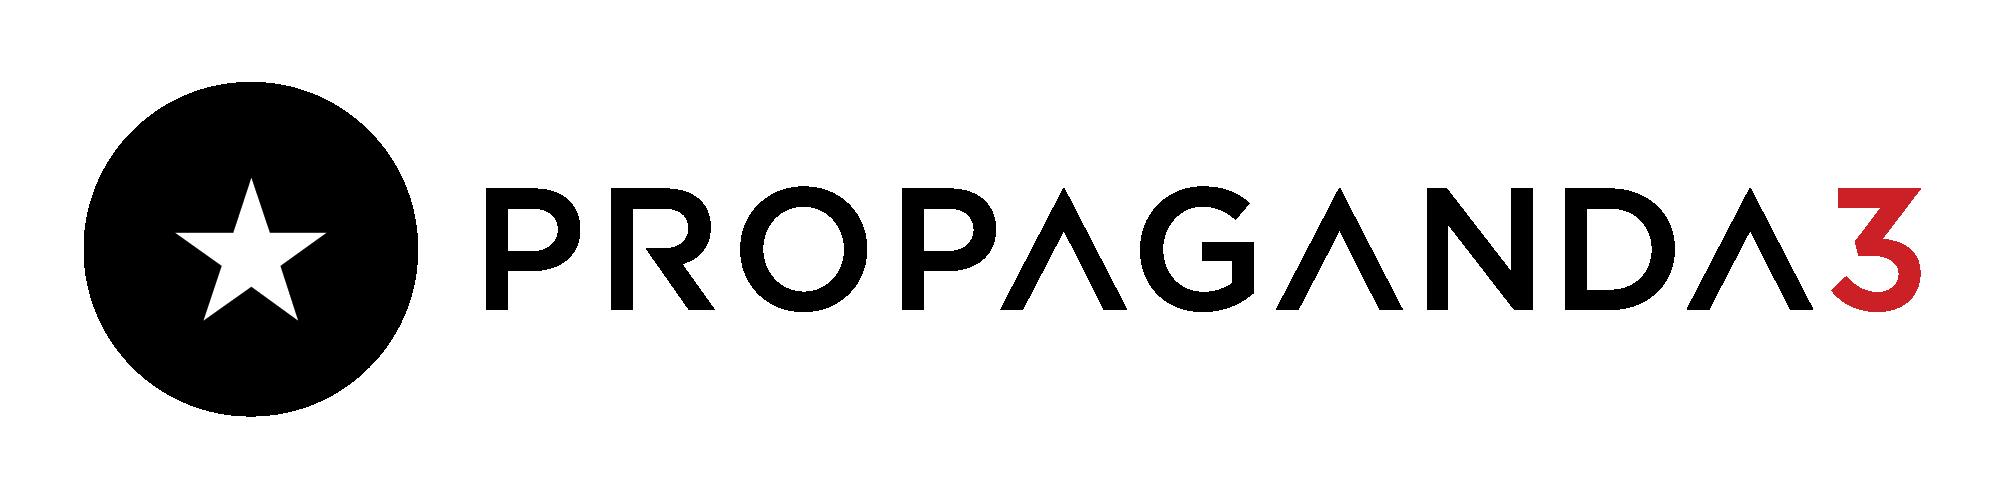 p3-logoHoriz-blackWhite.png